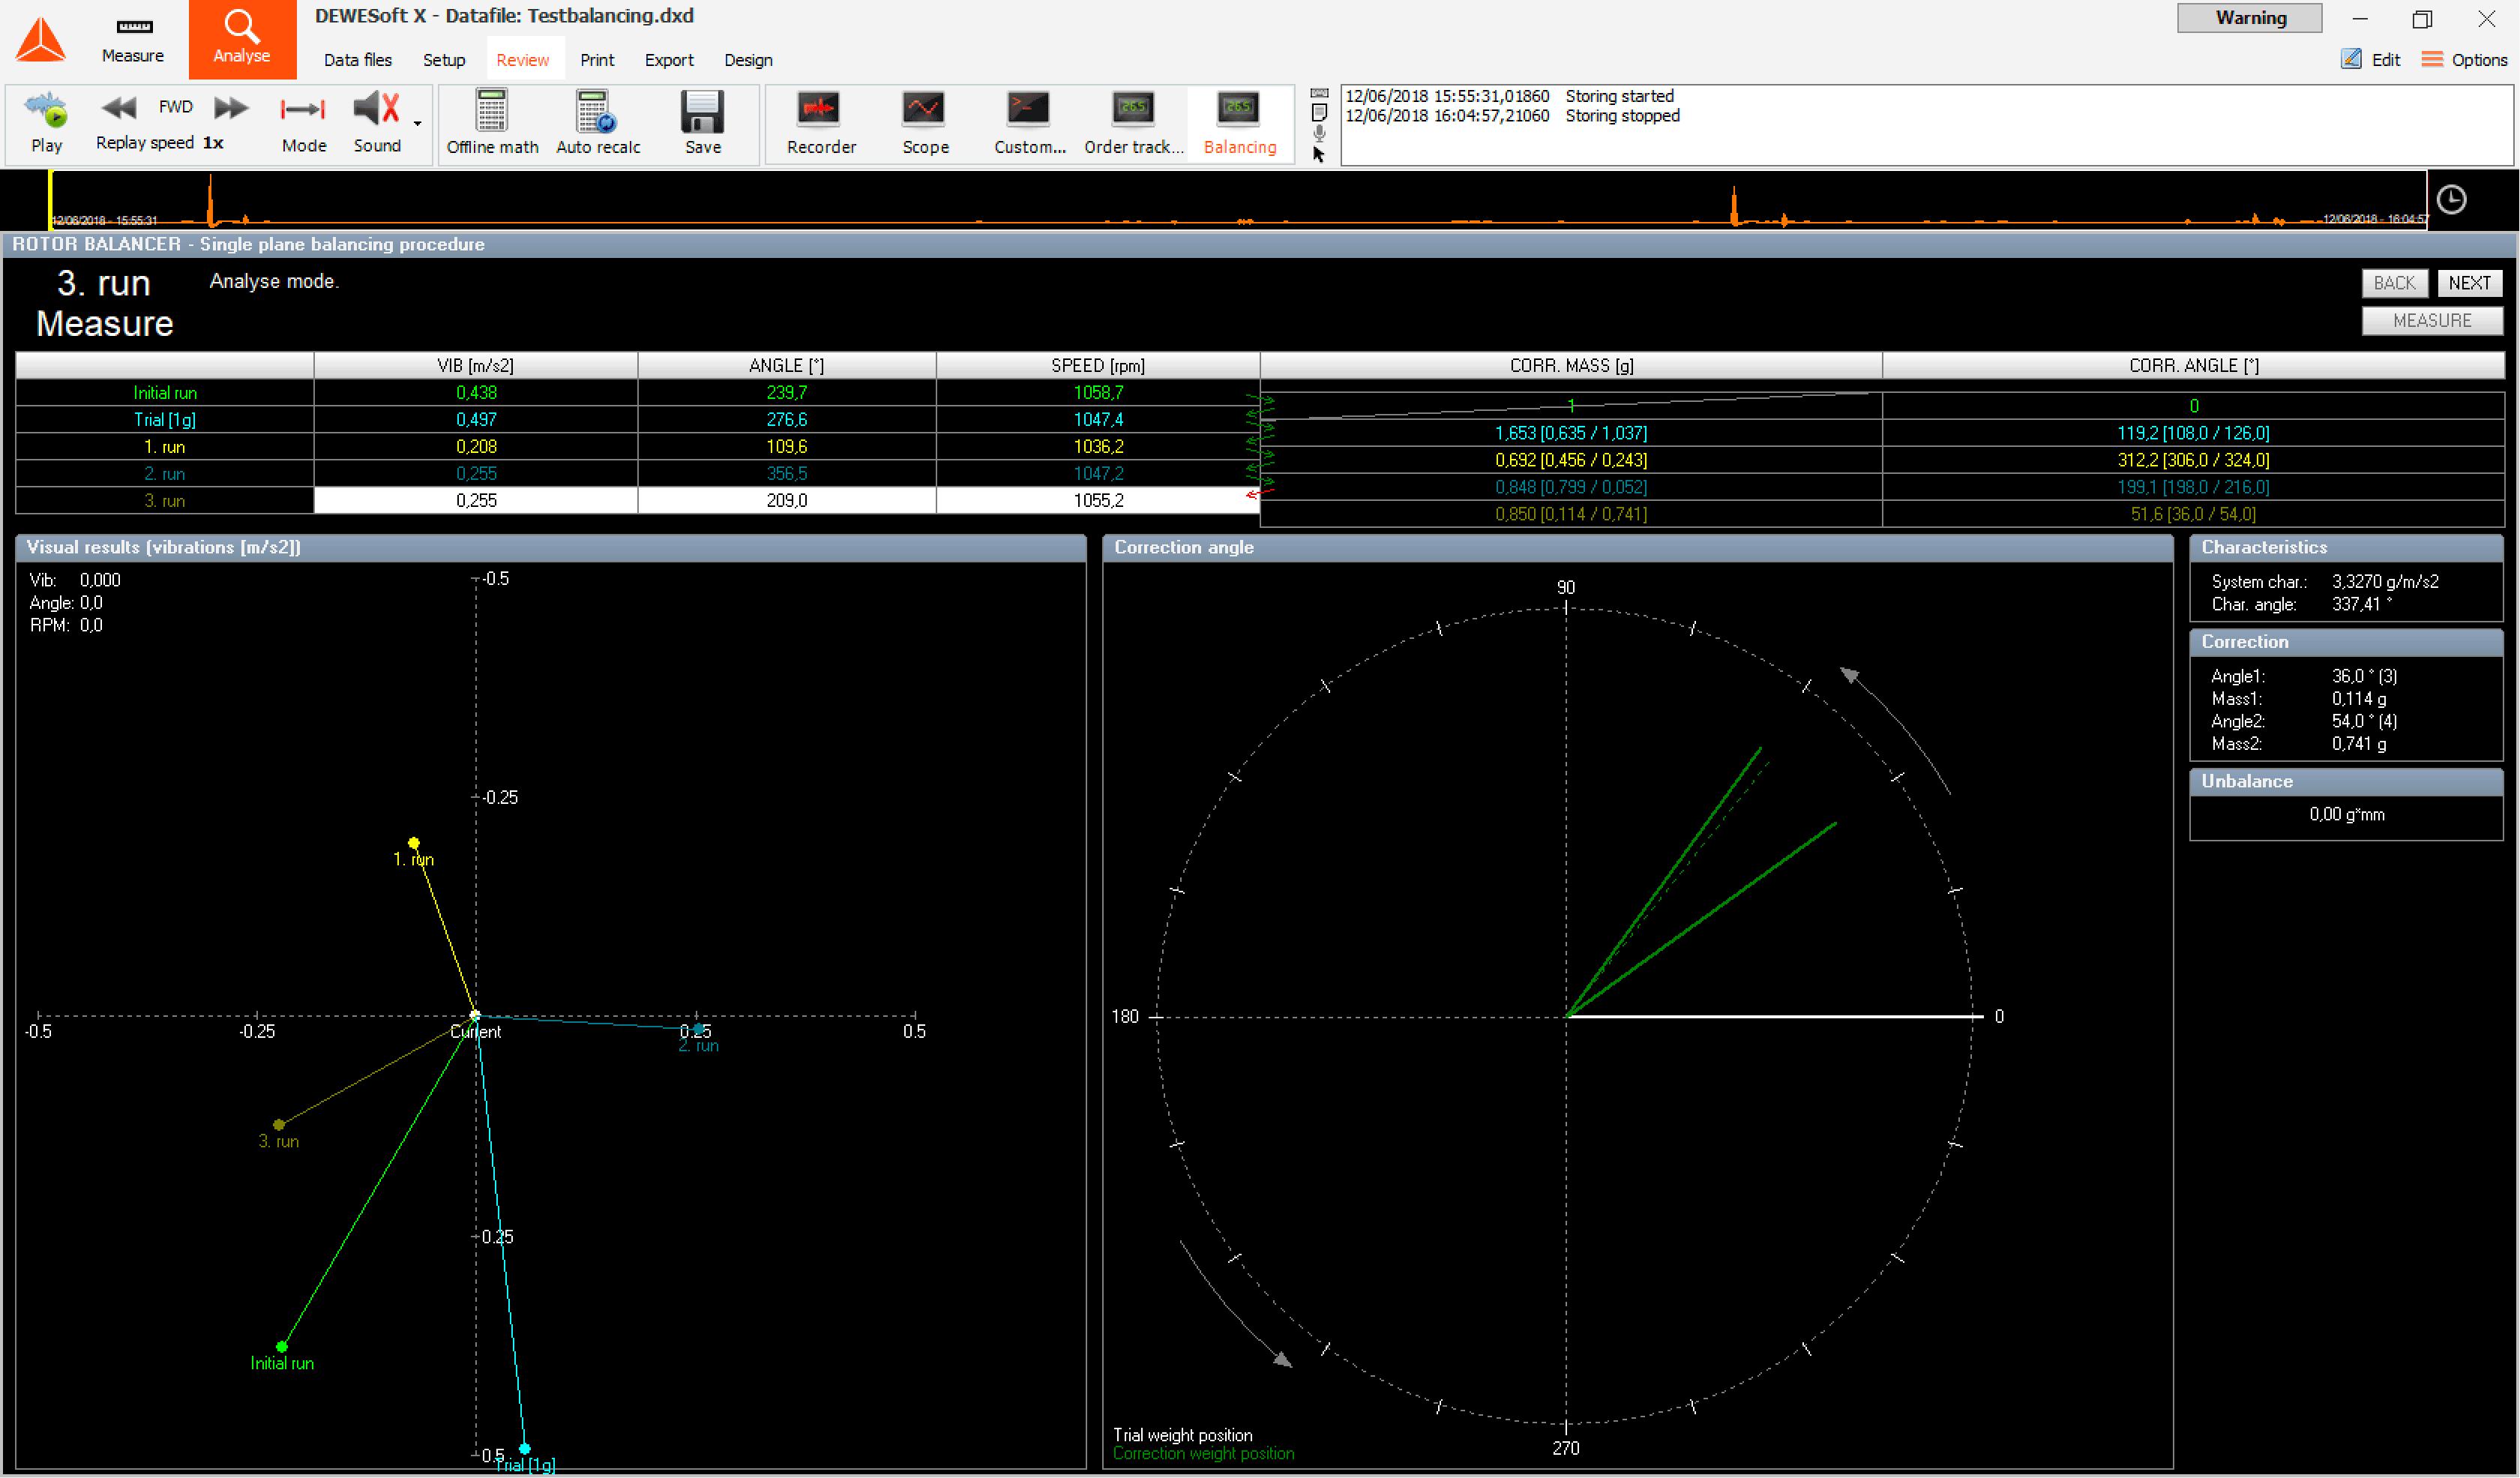 Rotor Balancing Software Screen by Dewesoft